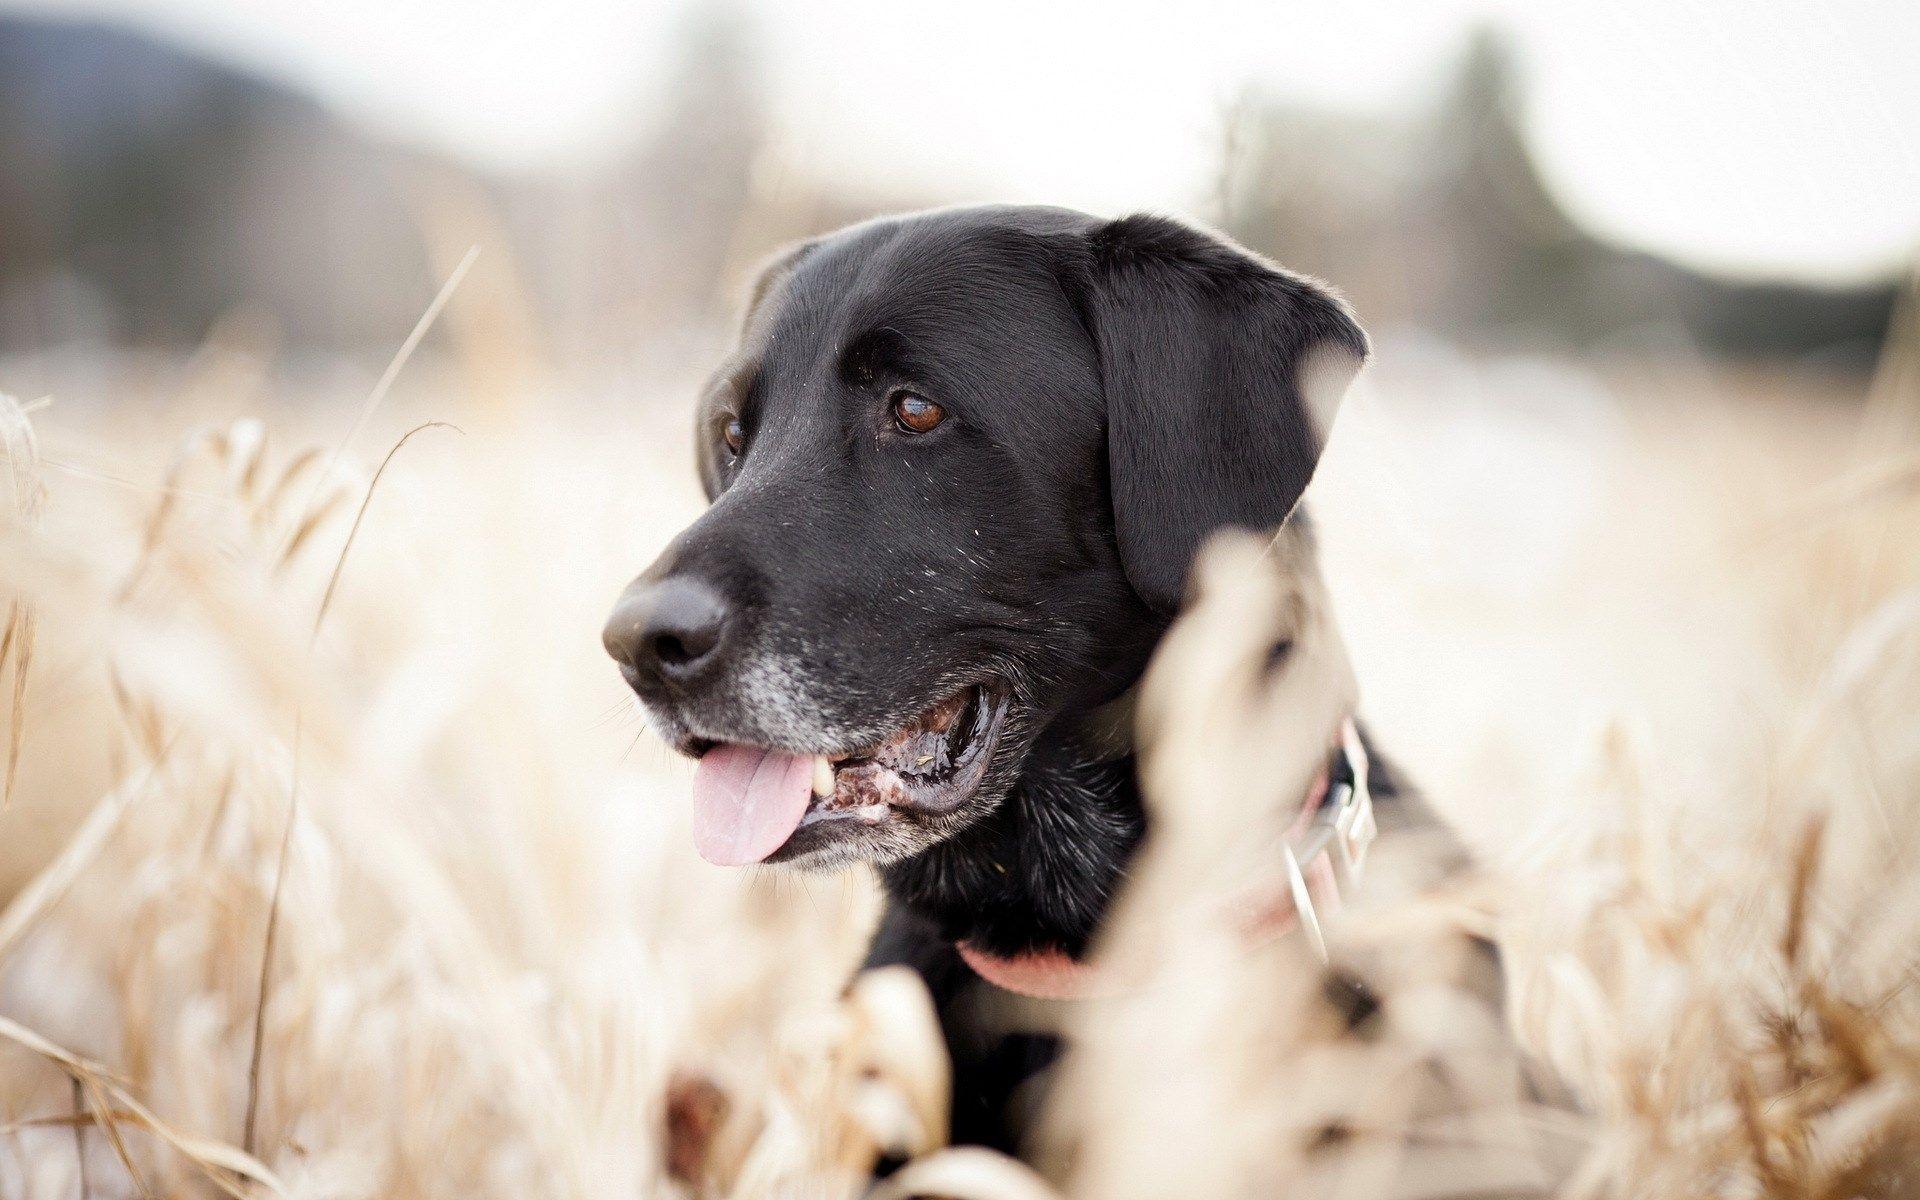 Looking Around Dog Black Field Focus Hd Wallpaper Wallpapersme Labrador Dog Dog Wallpaper Dogs